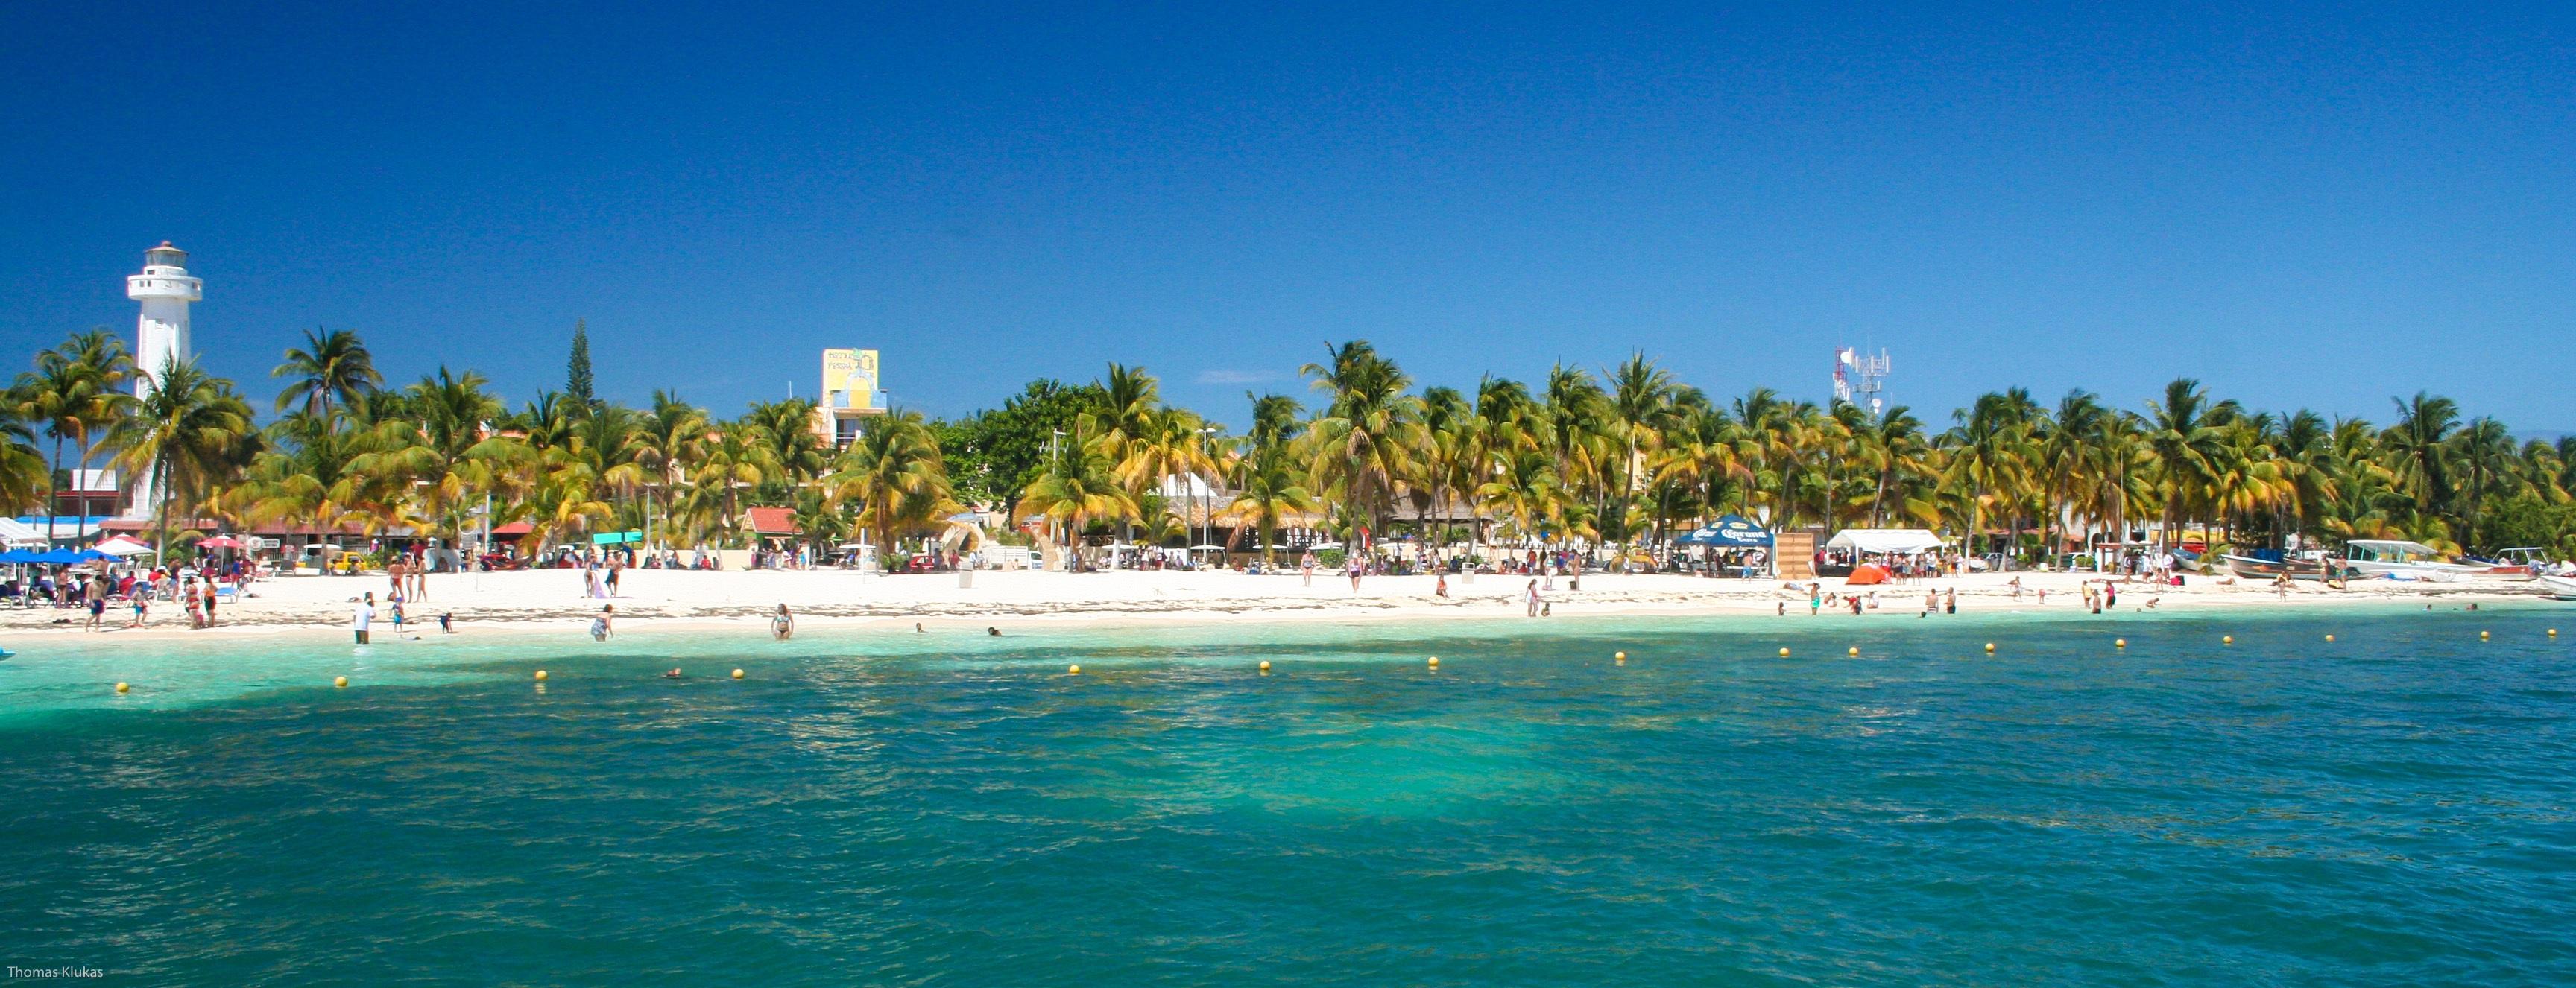 Beach Sea Coast Water Summer Vacation Holiday Lagoon Bay Island Marina Leisure Resort Mexico Caribbean Cancun